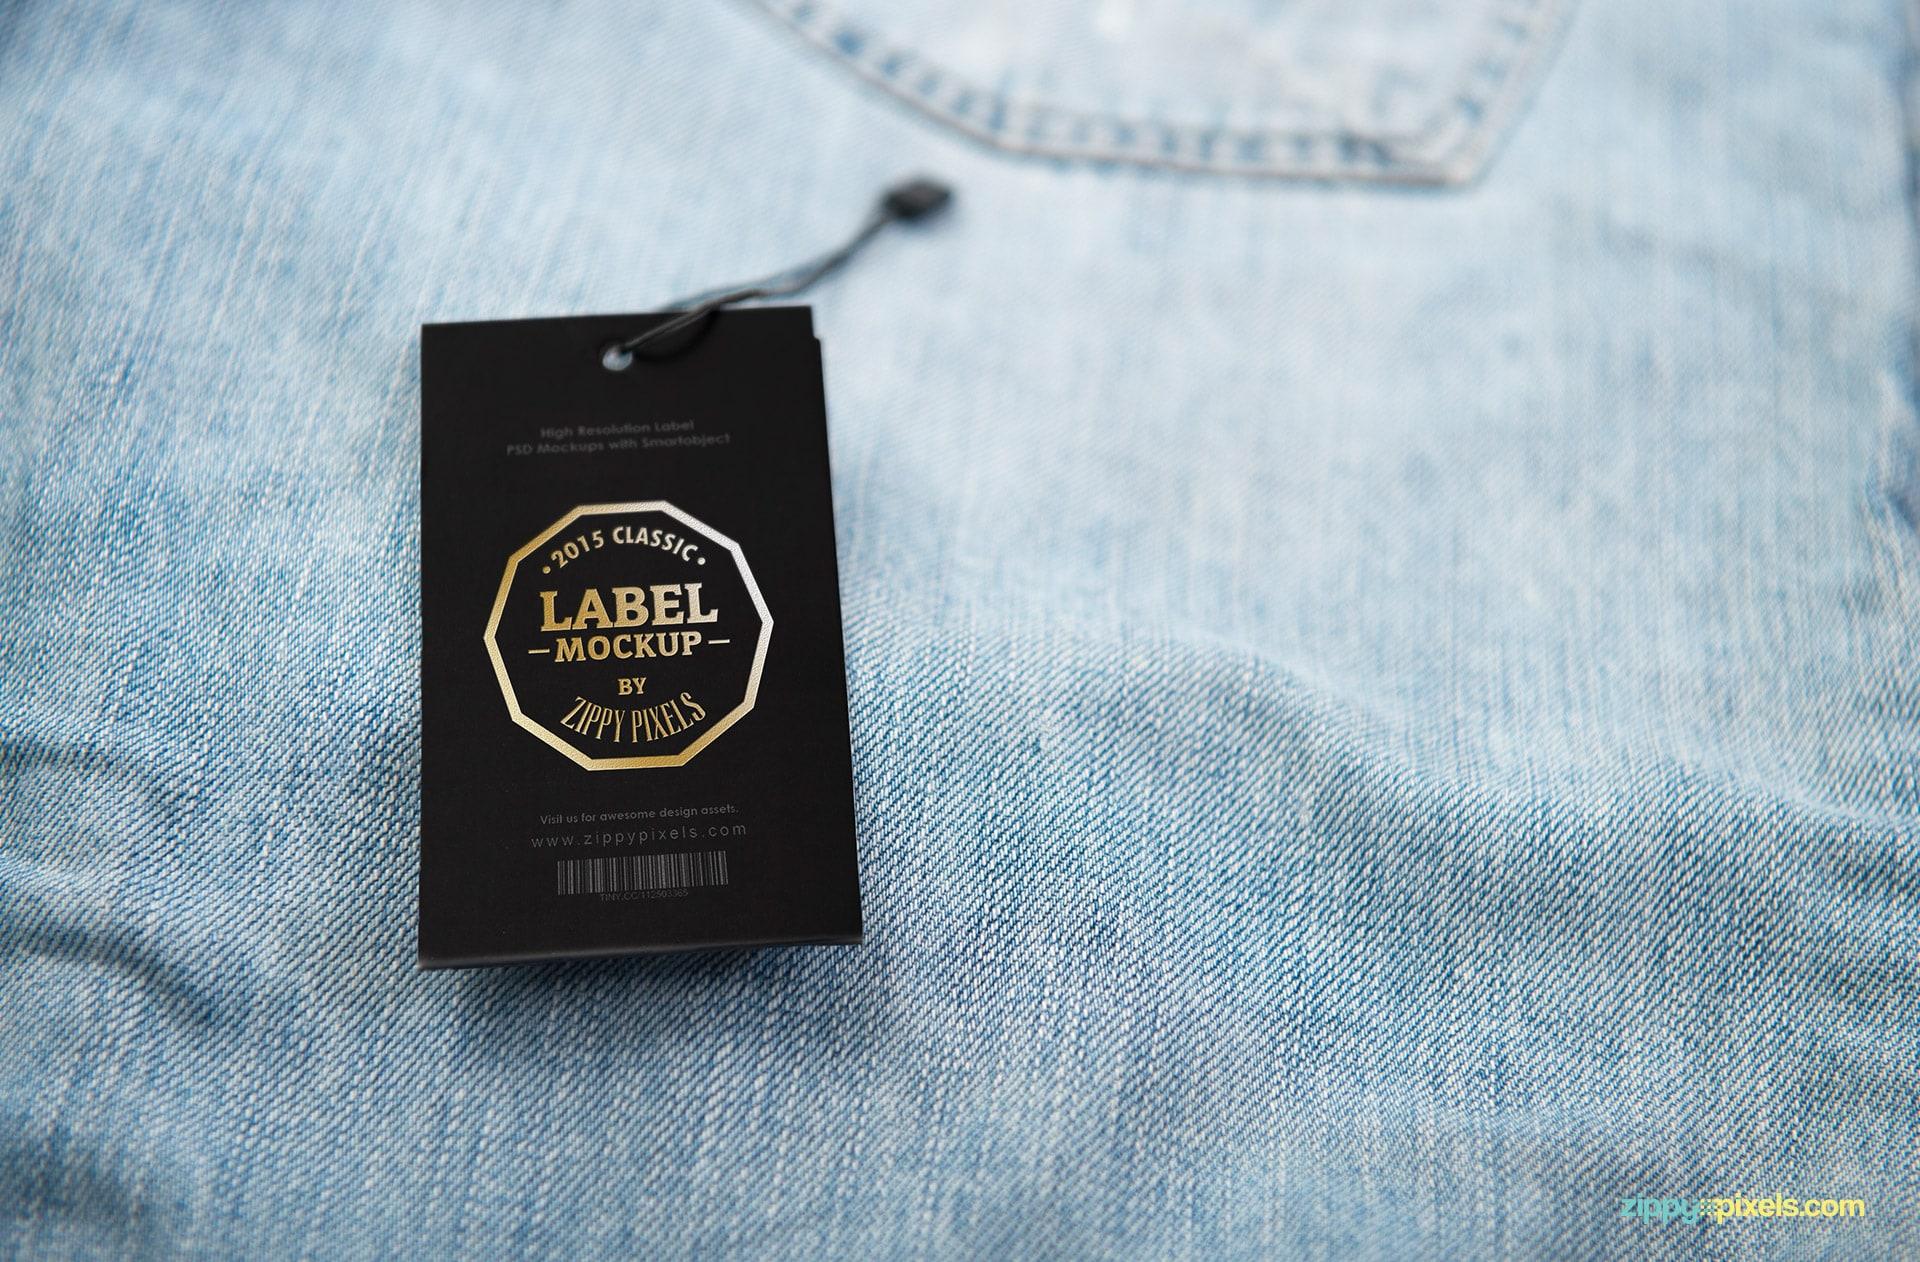 05-branding-tag-mockups-824x542